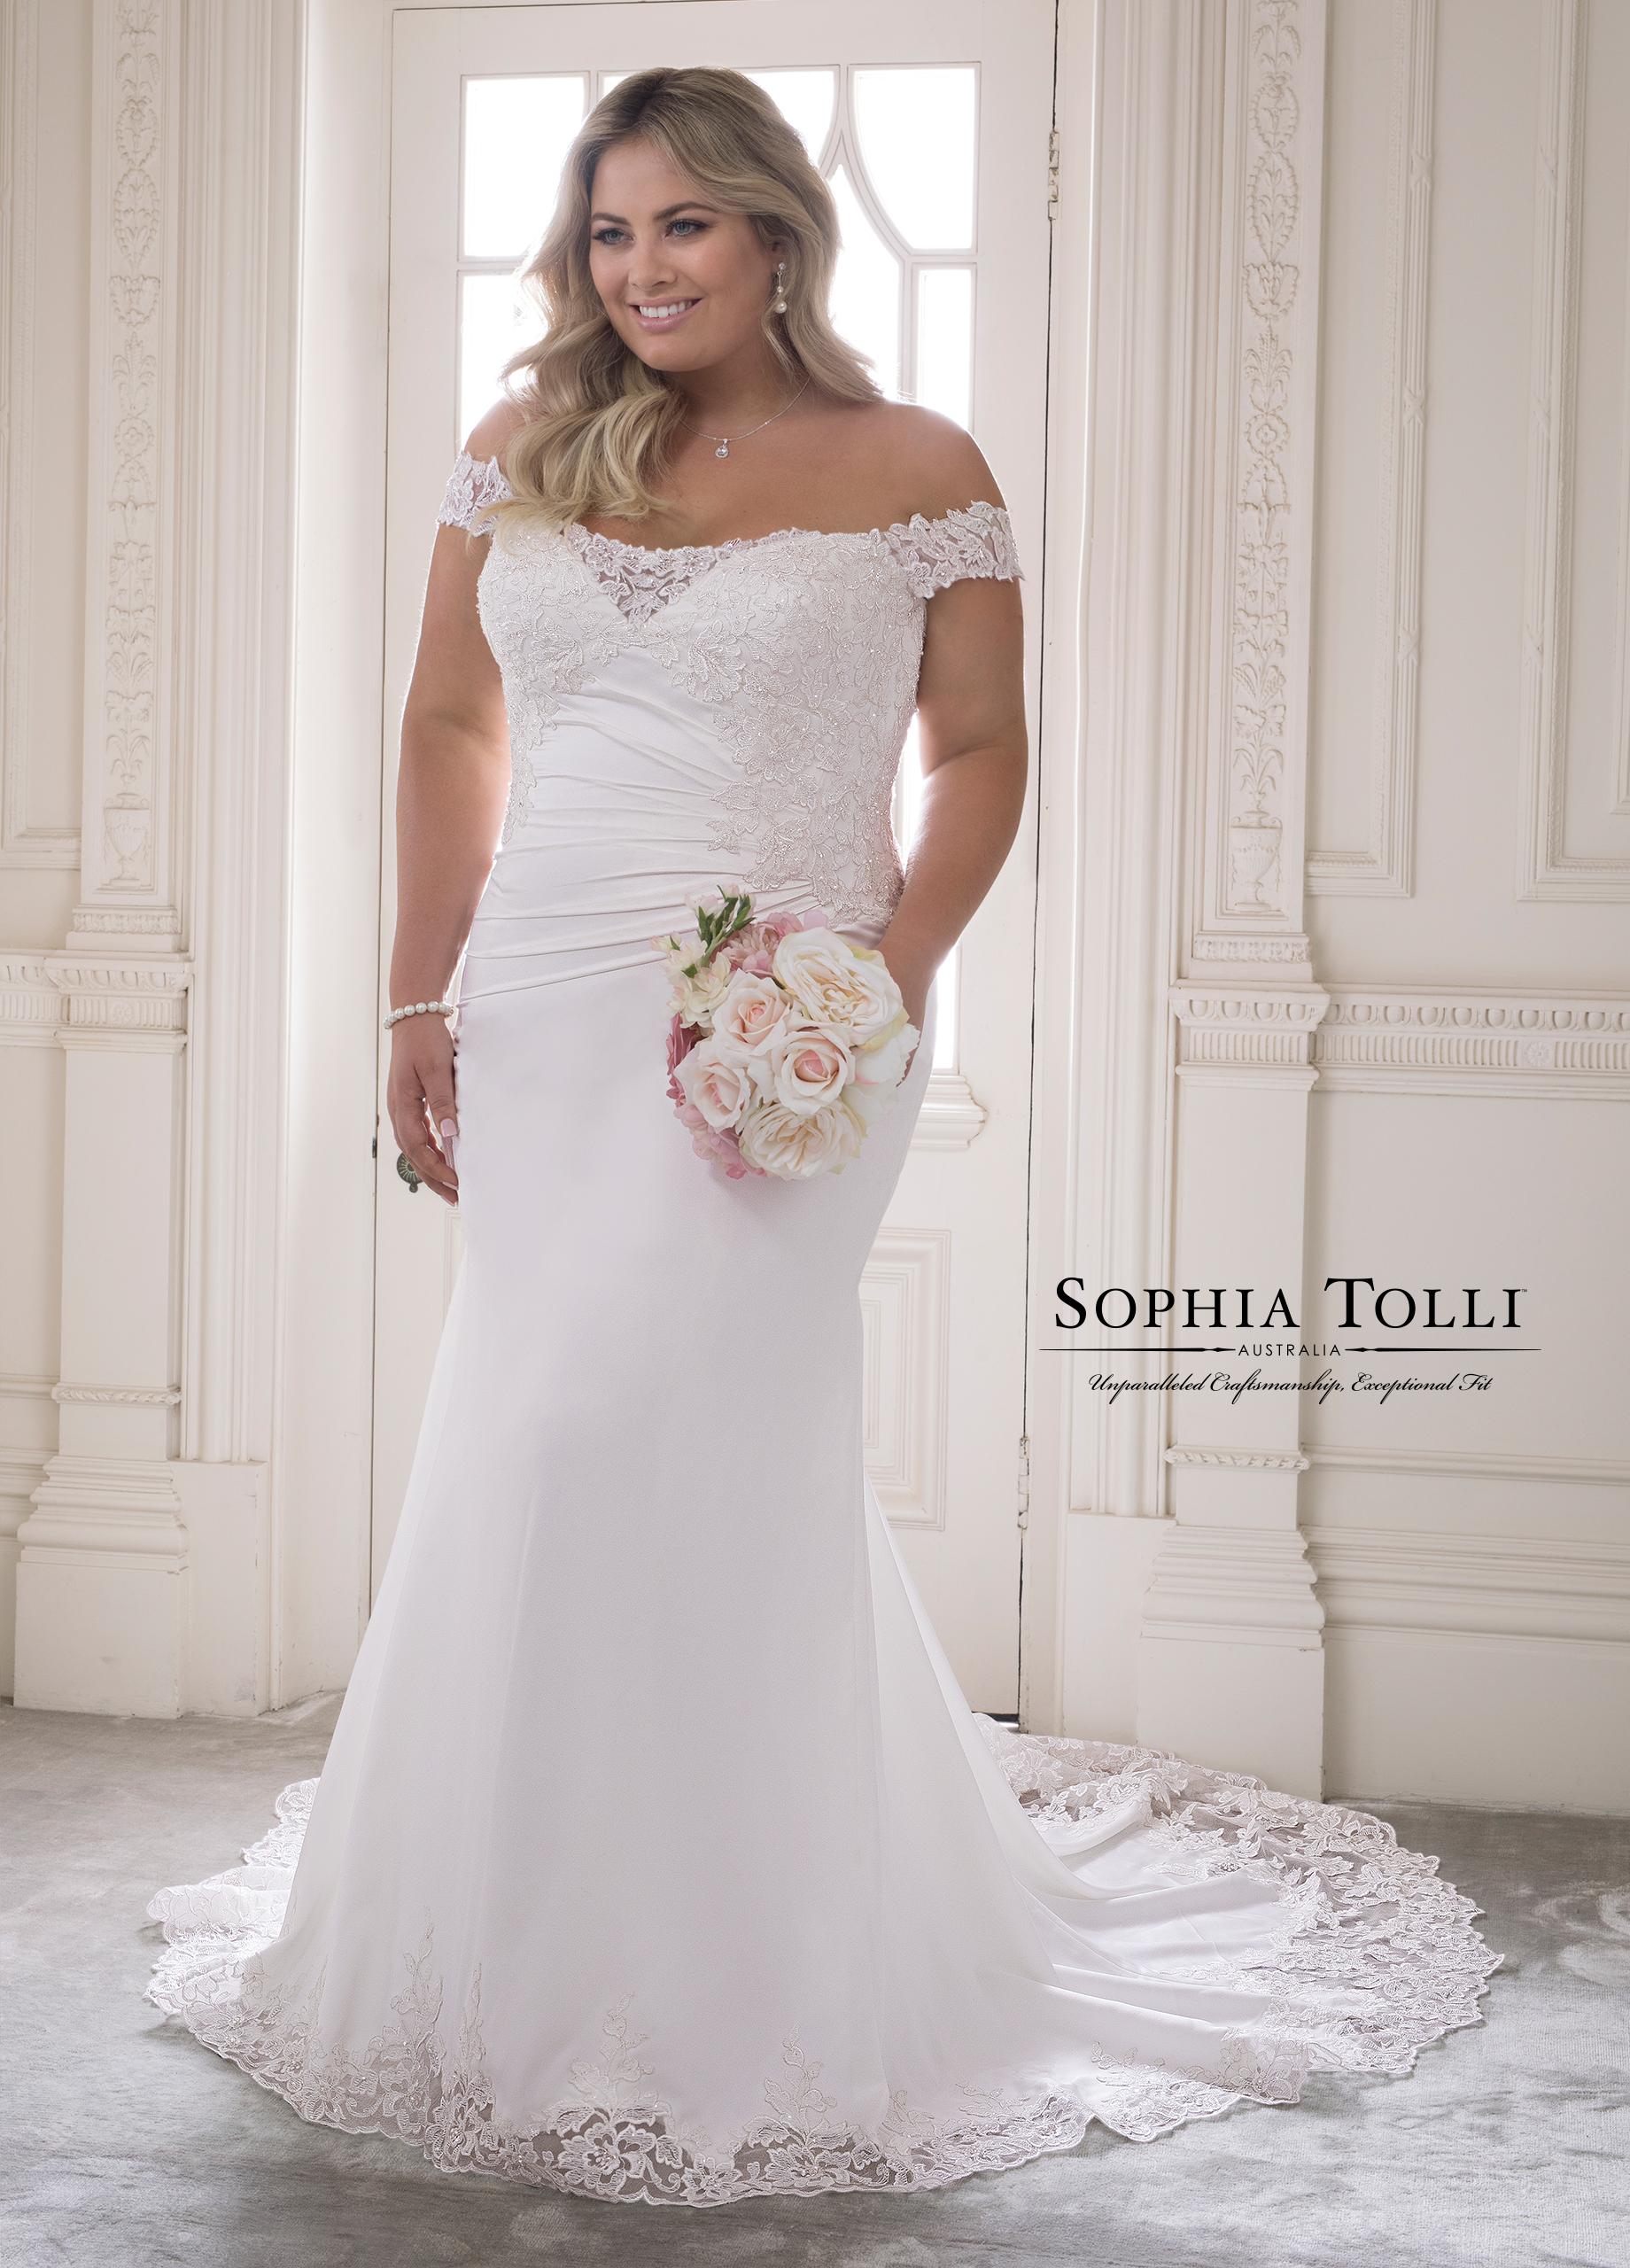 Sophia Tolli Y21820LS Jasper Dress - MadameBridal.com